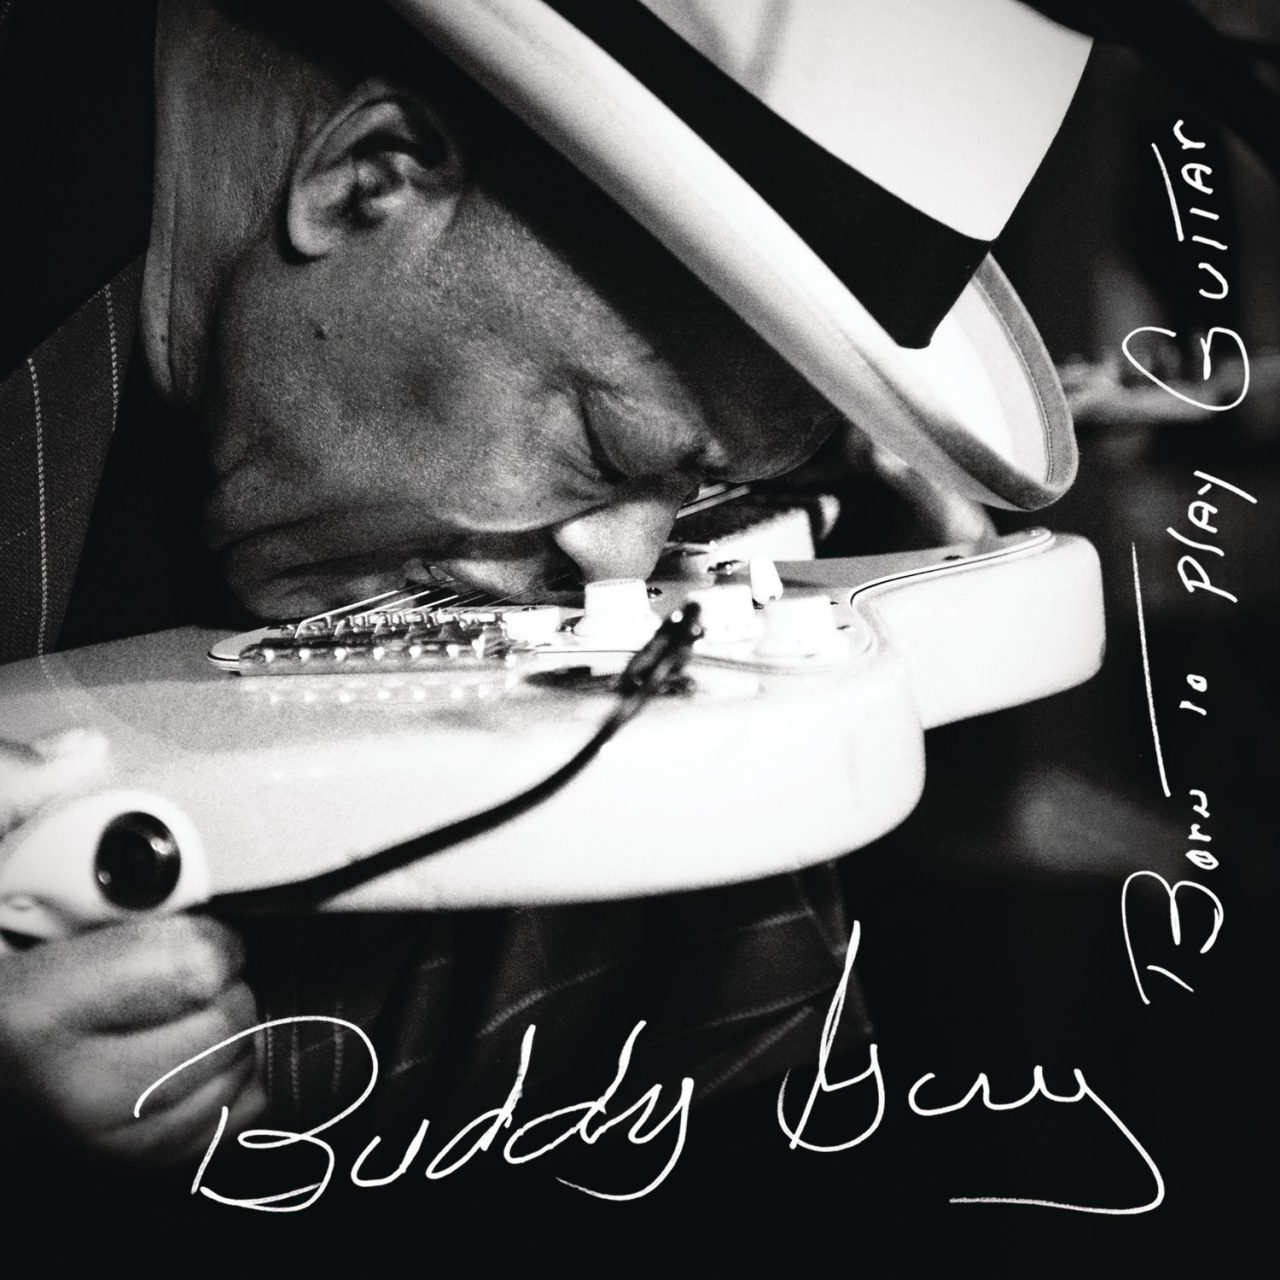 Buddy Guy – Born To Play Guitar